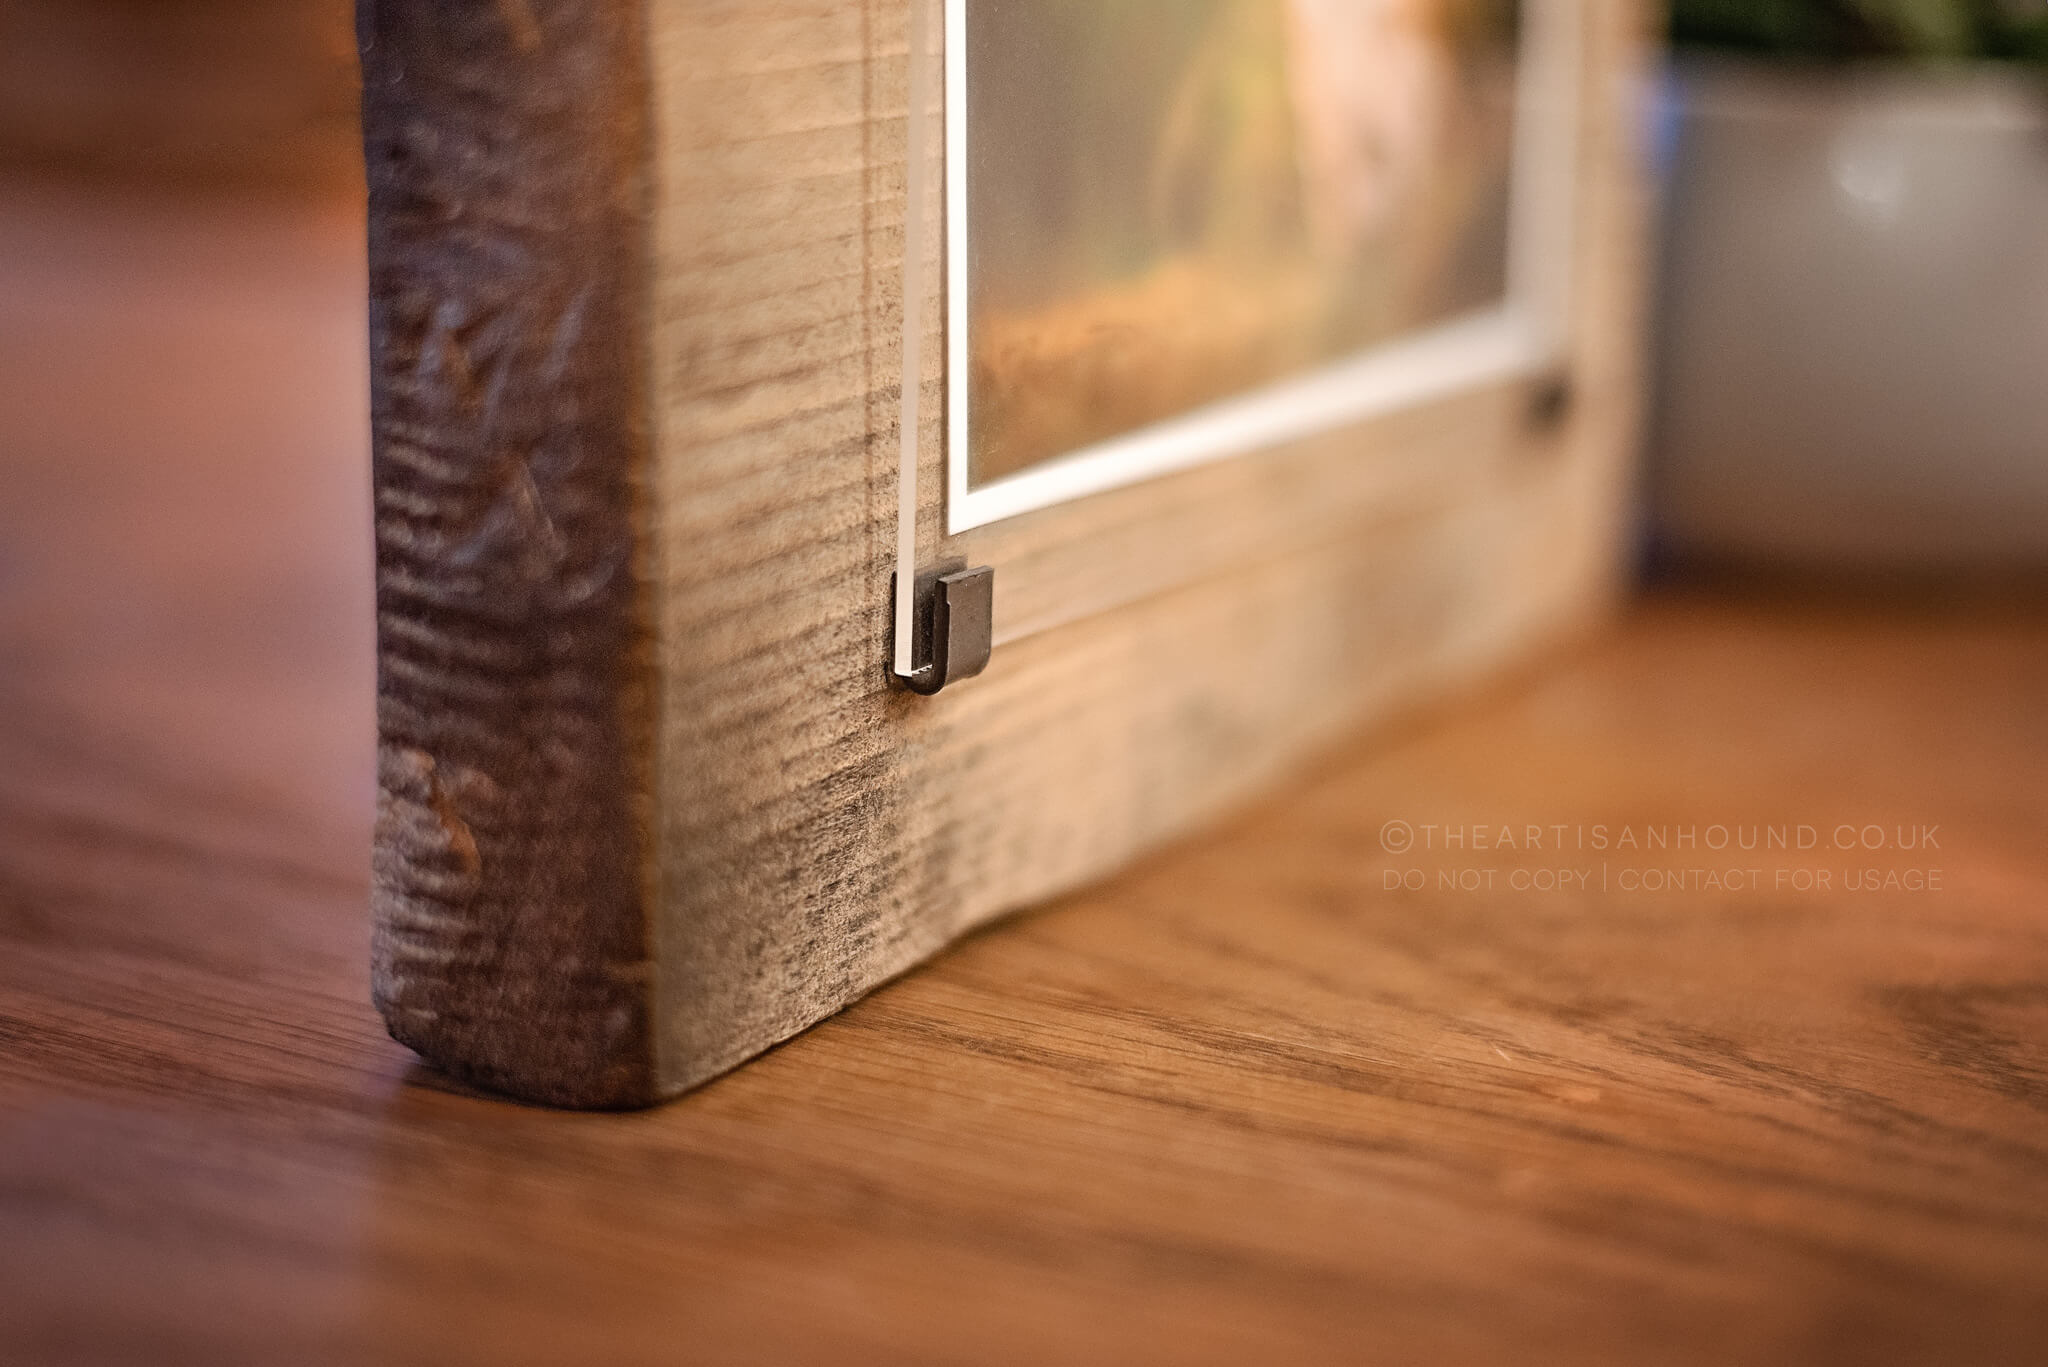 corner-detail-of-wooden-phot-frame